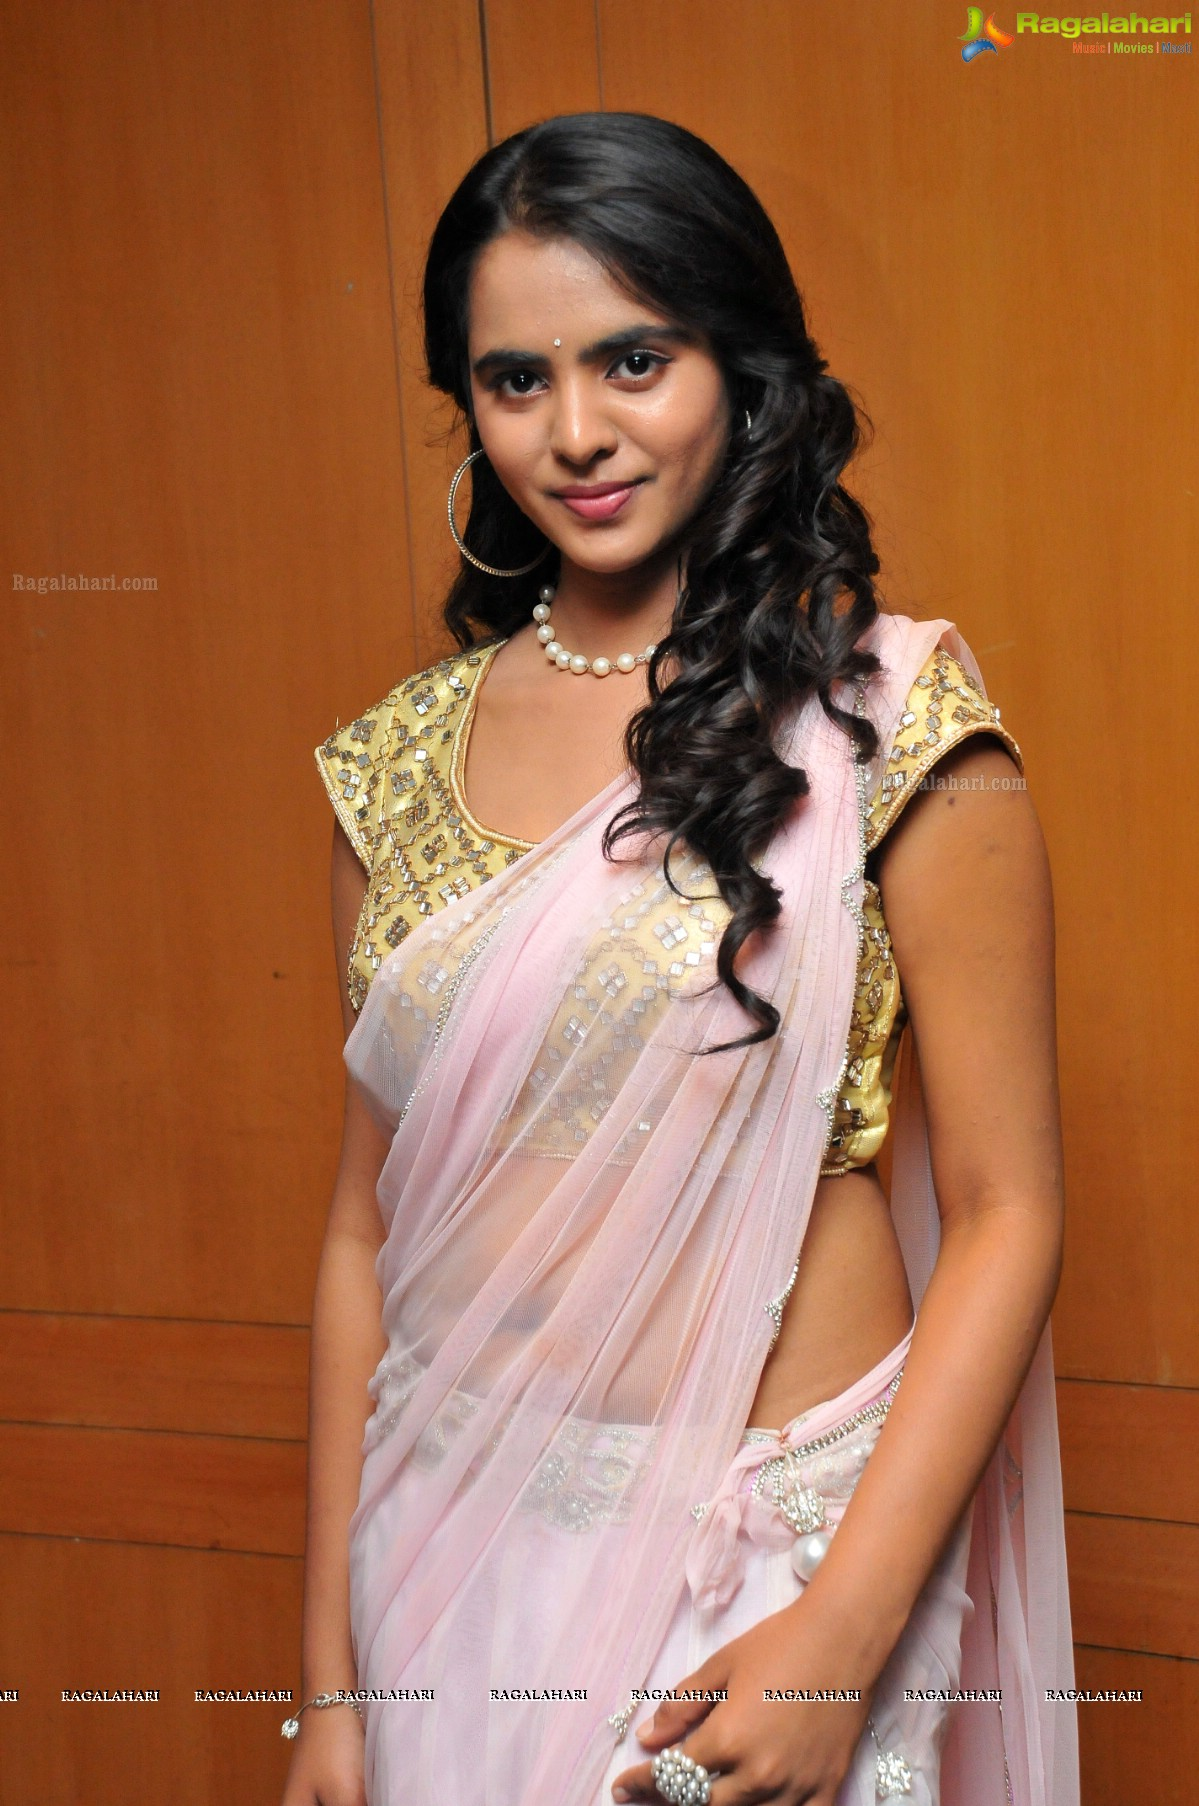 Ugadi 2014 Telugu Date Manasa Himavarsha Imag...